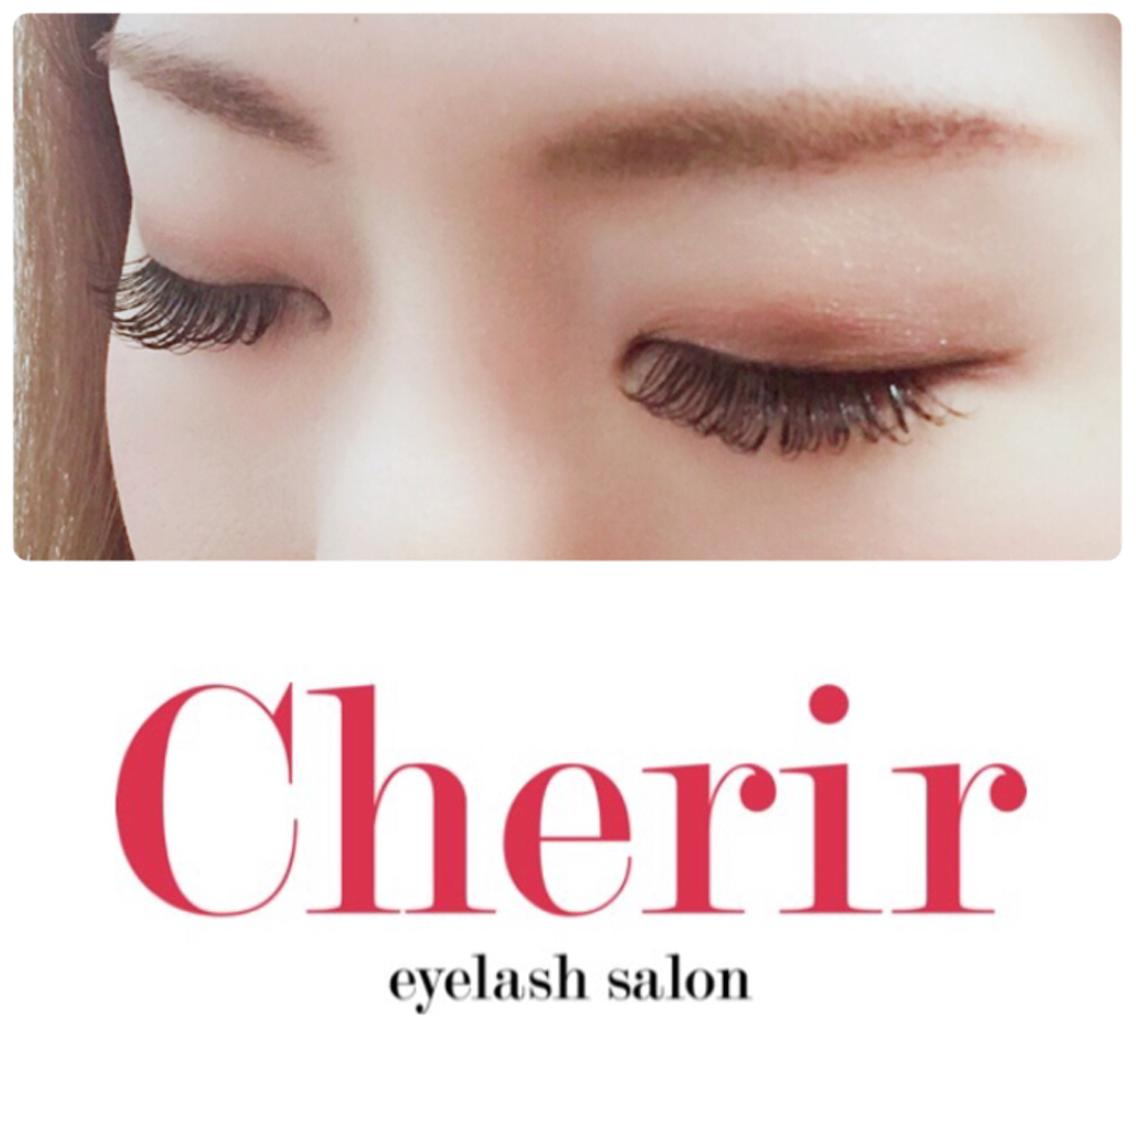 Eyelash Salon Cherir所属・Cherir 西田の掲載